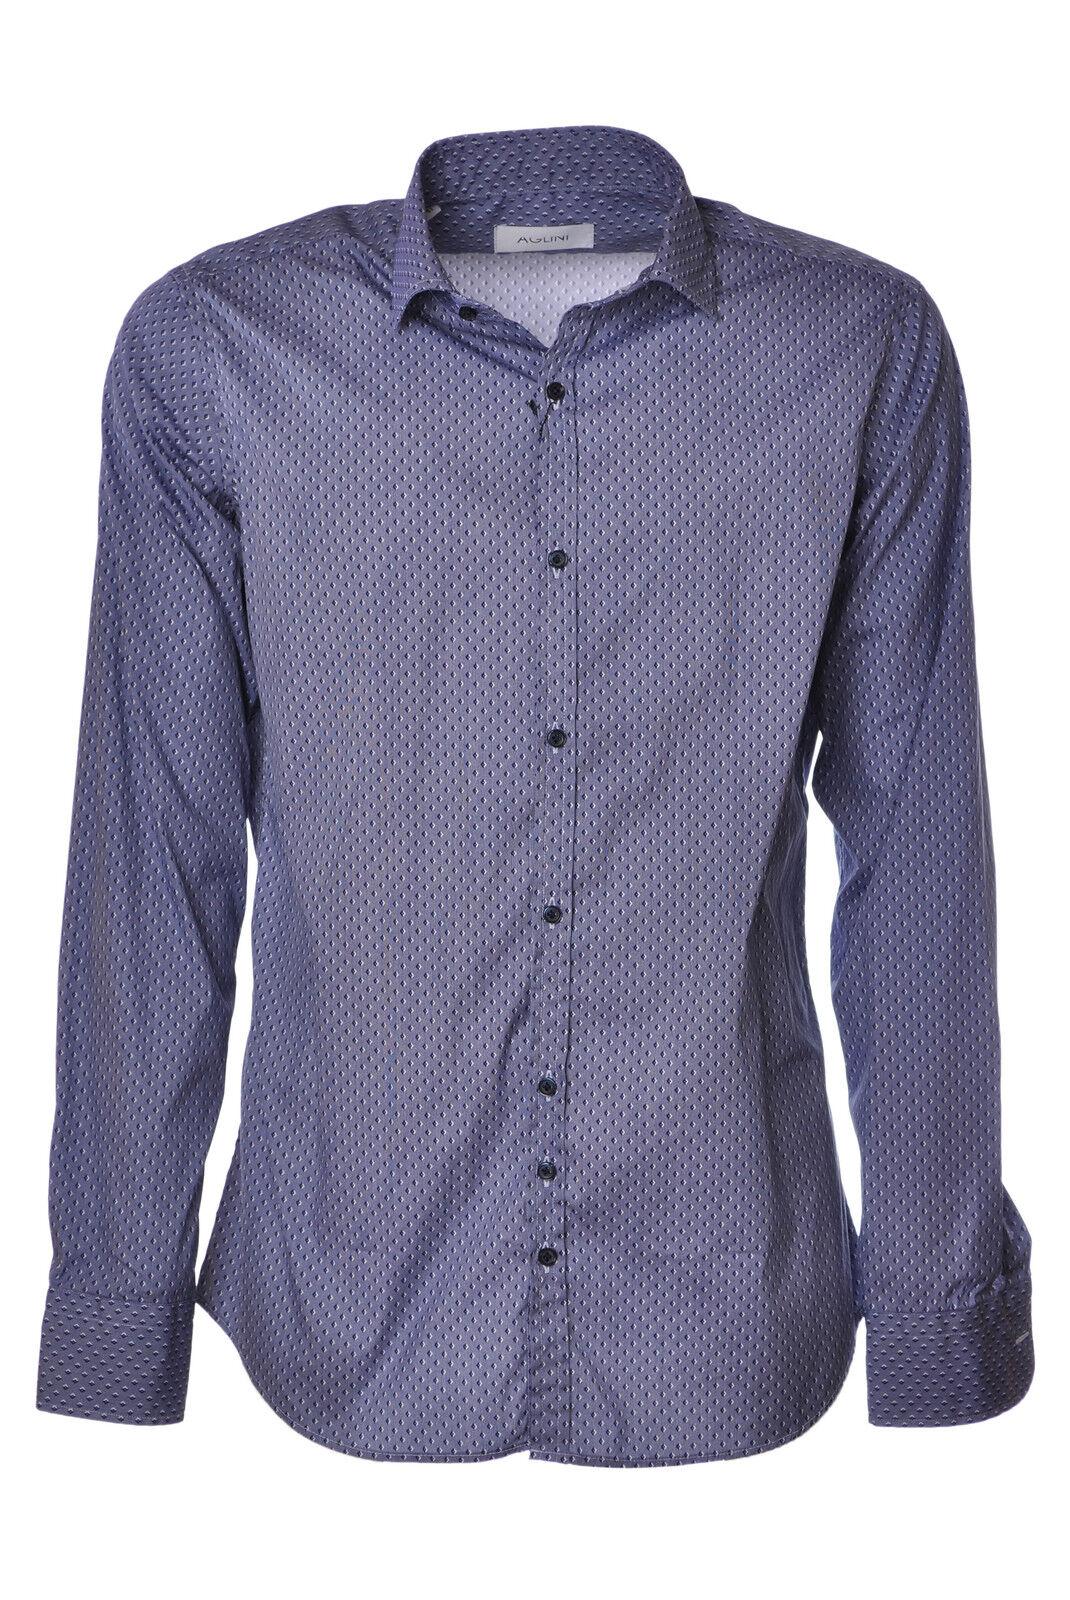 Aglini - Blusen-Shirt - Mann - Blau - 2703827M184935